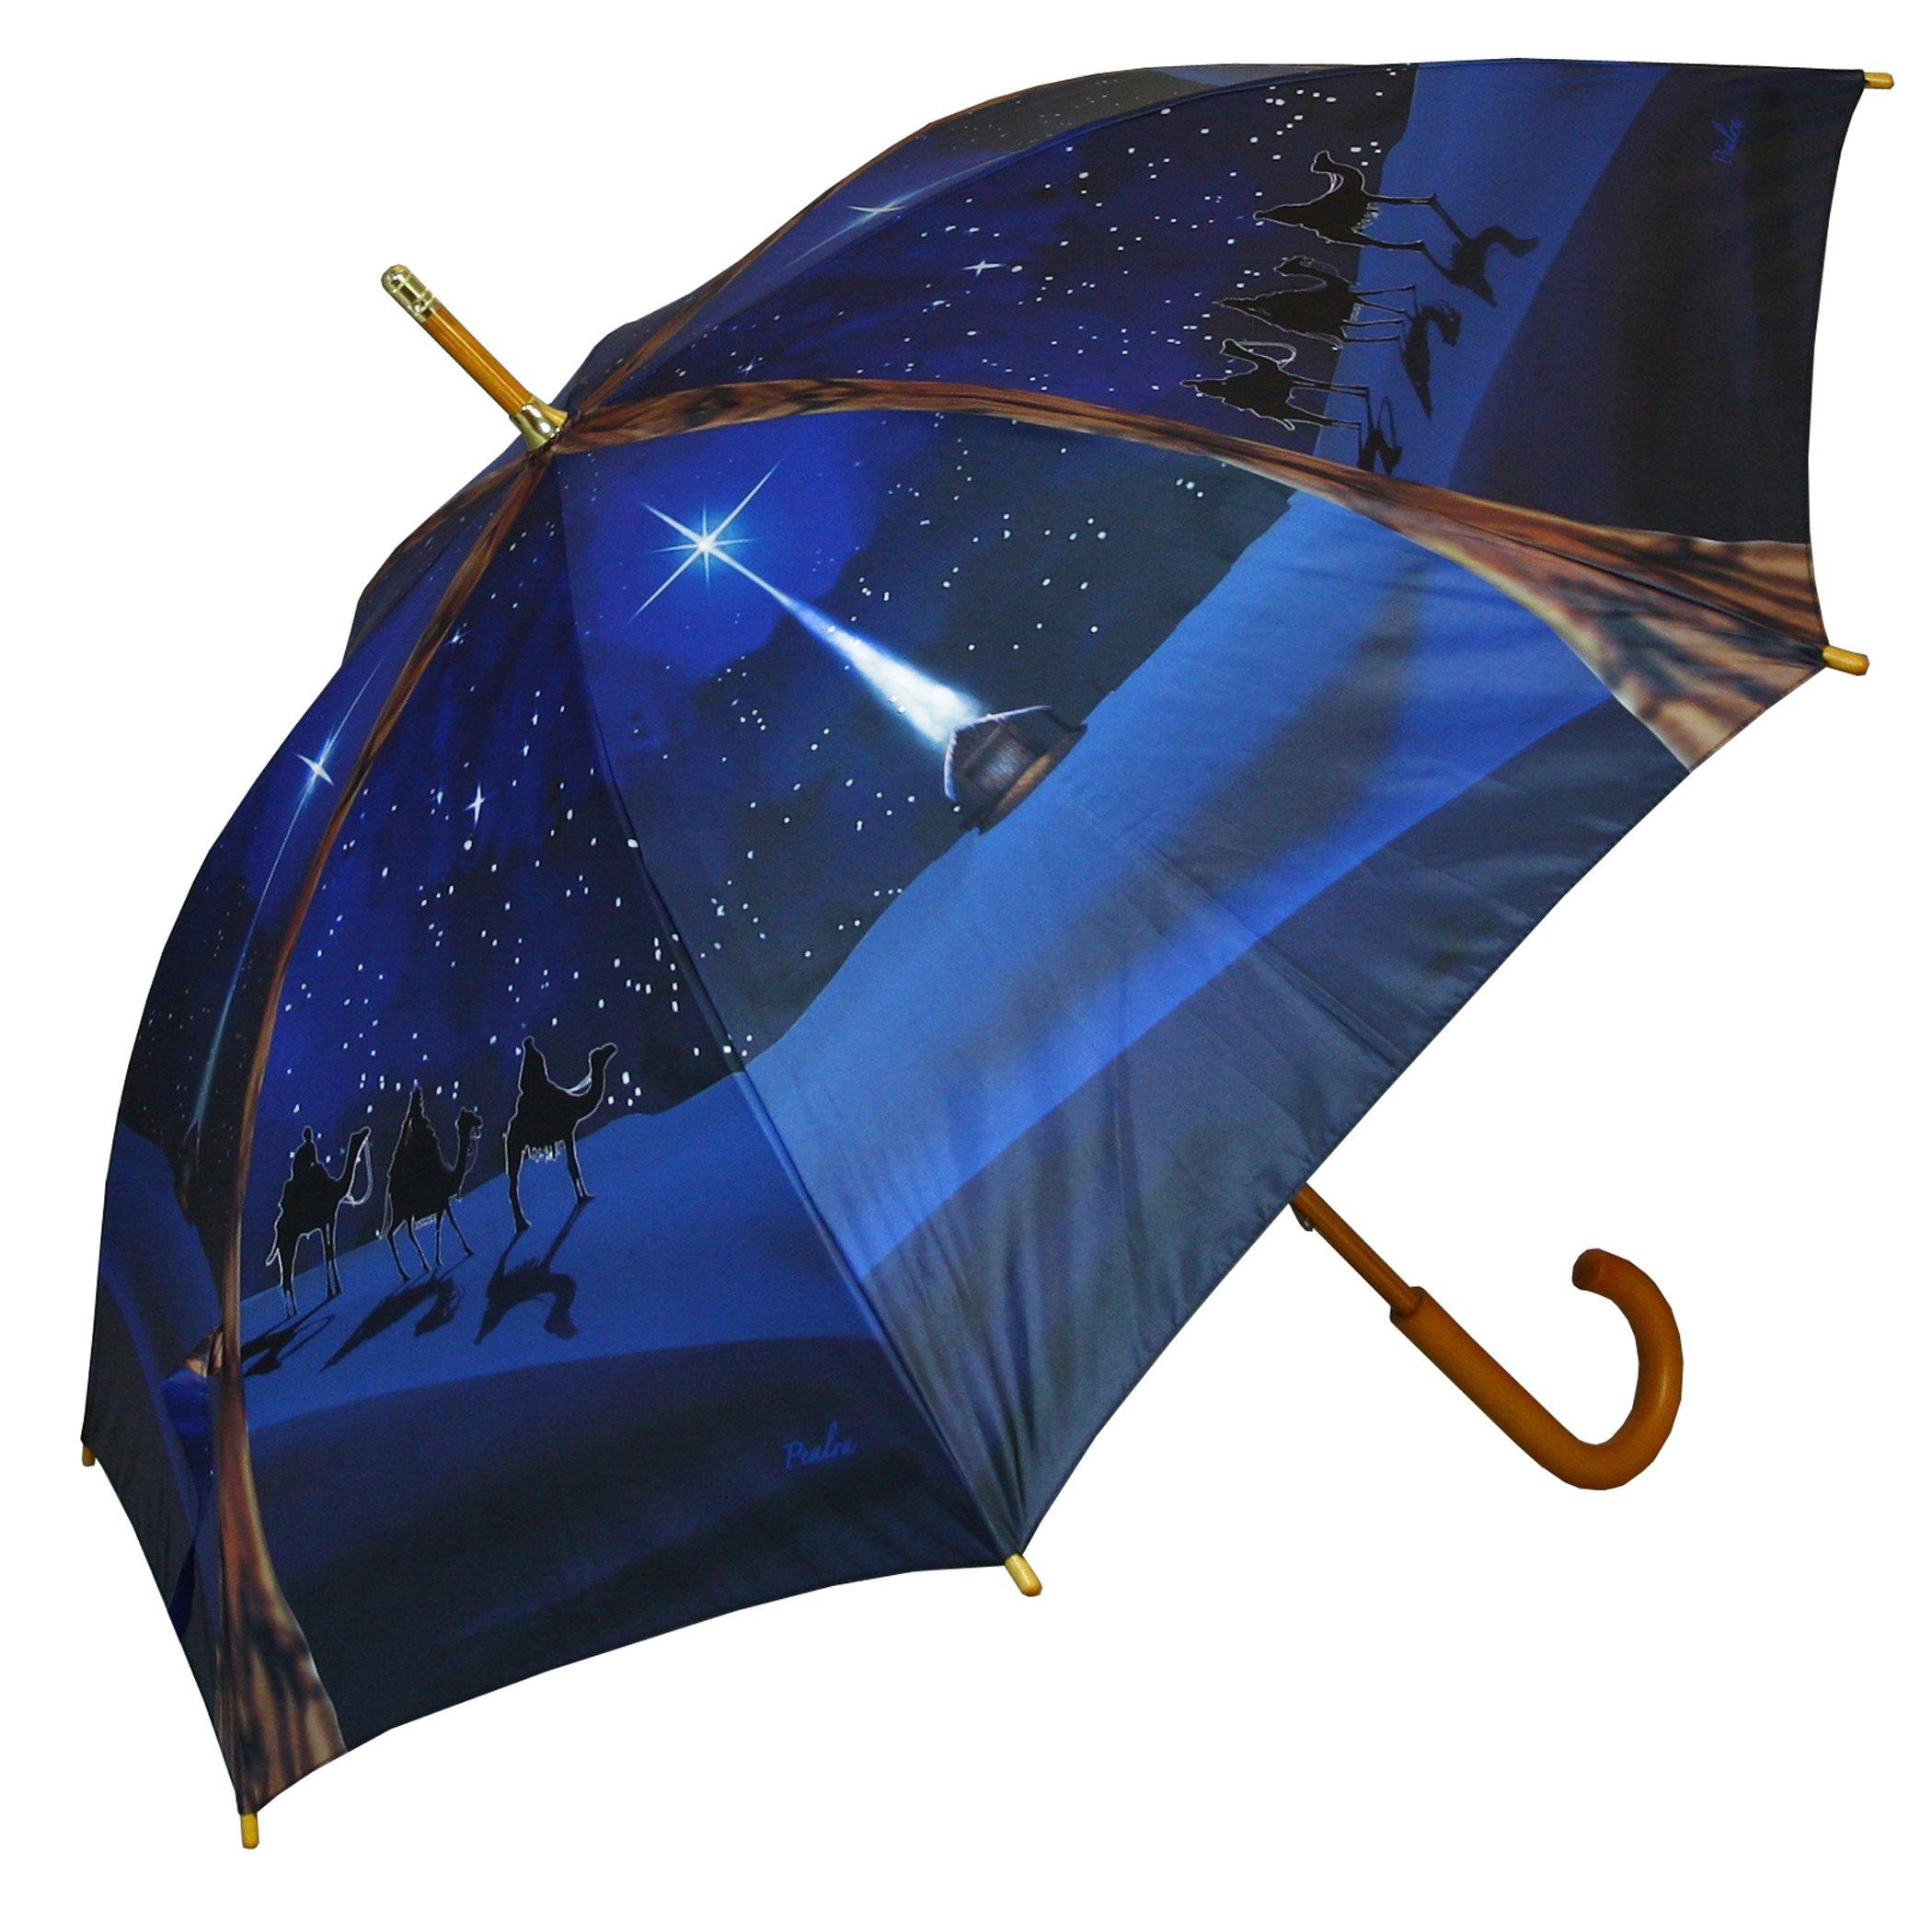 PealRa Holy Night Umbrella